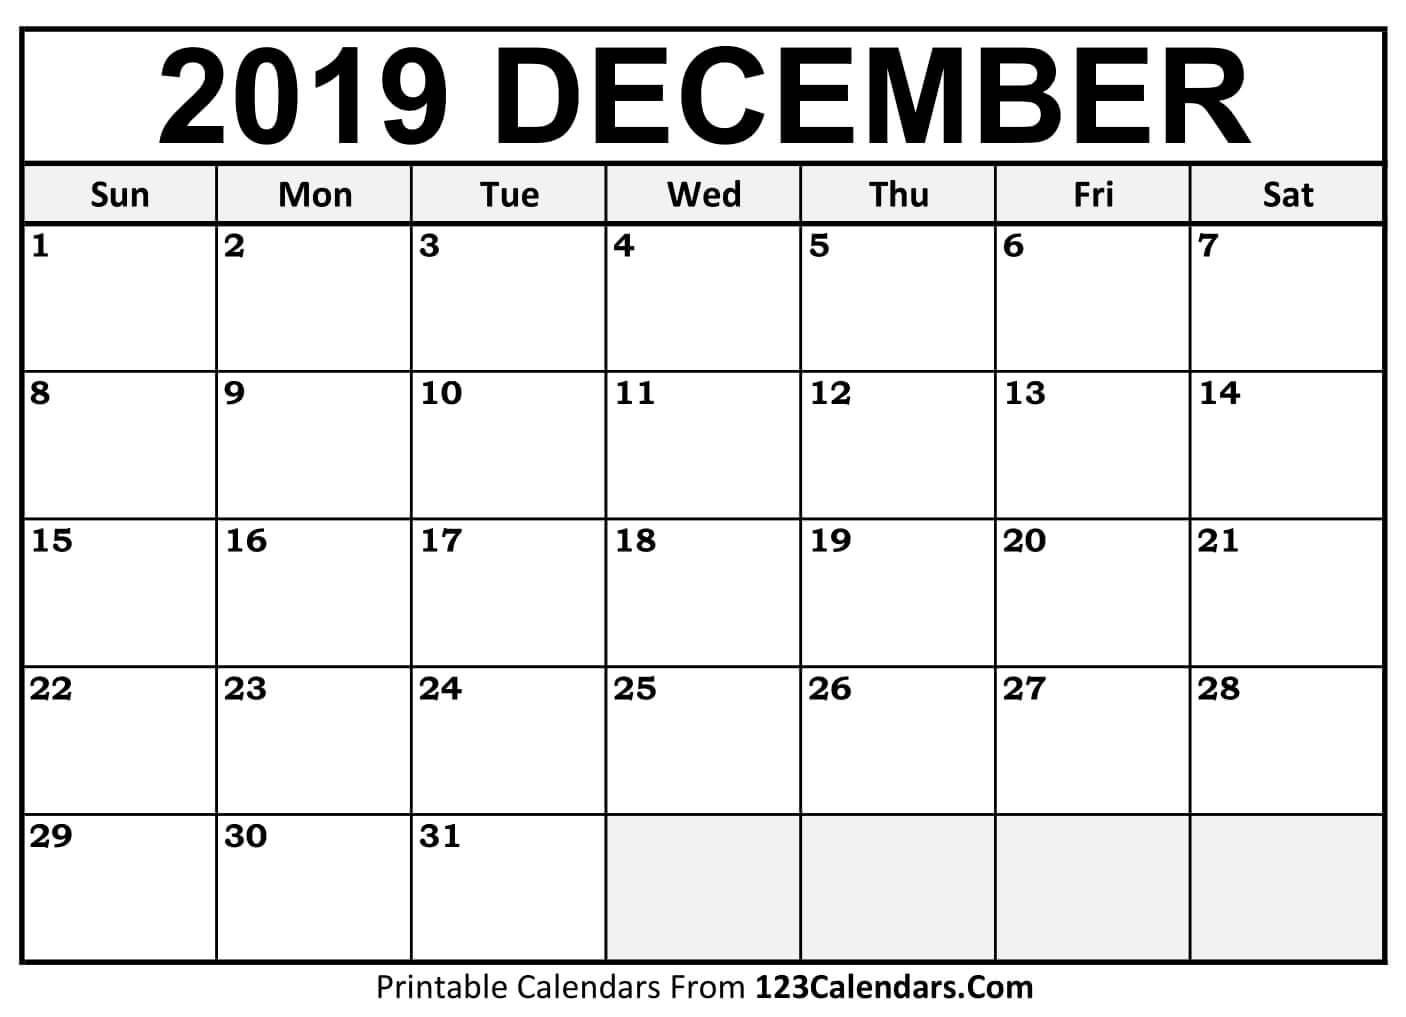 Printable December 2019 Calendar Templates 123Calendars